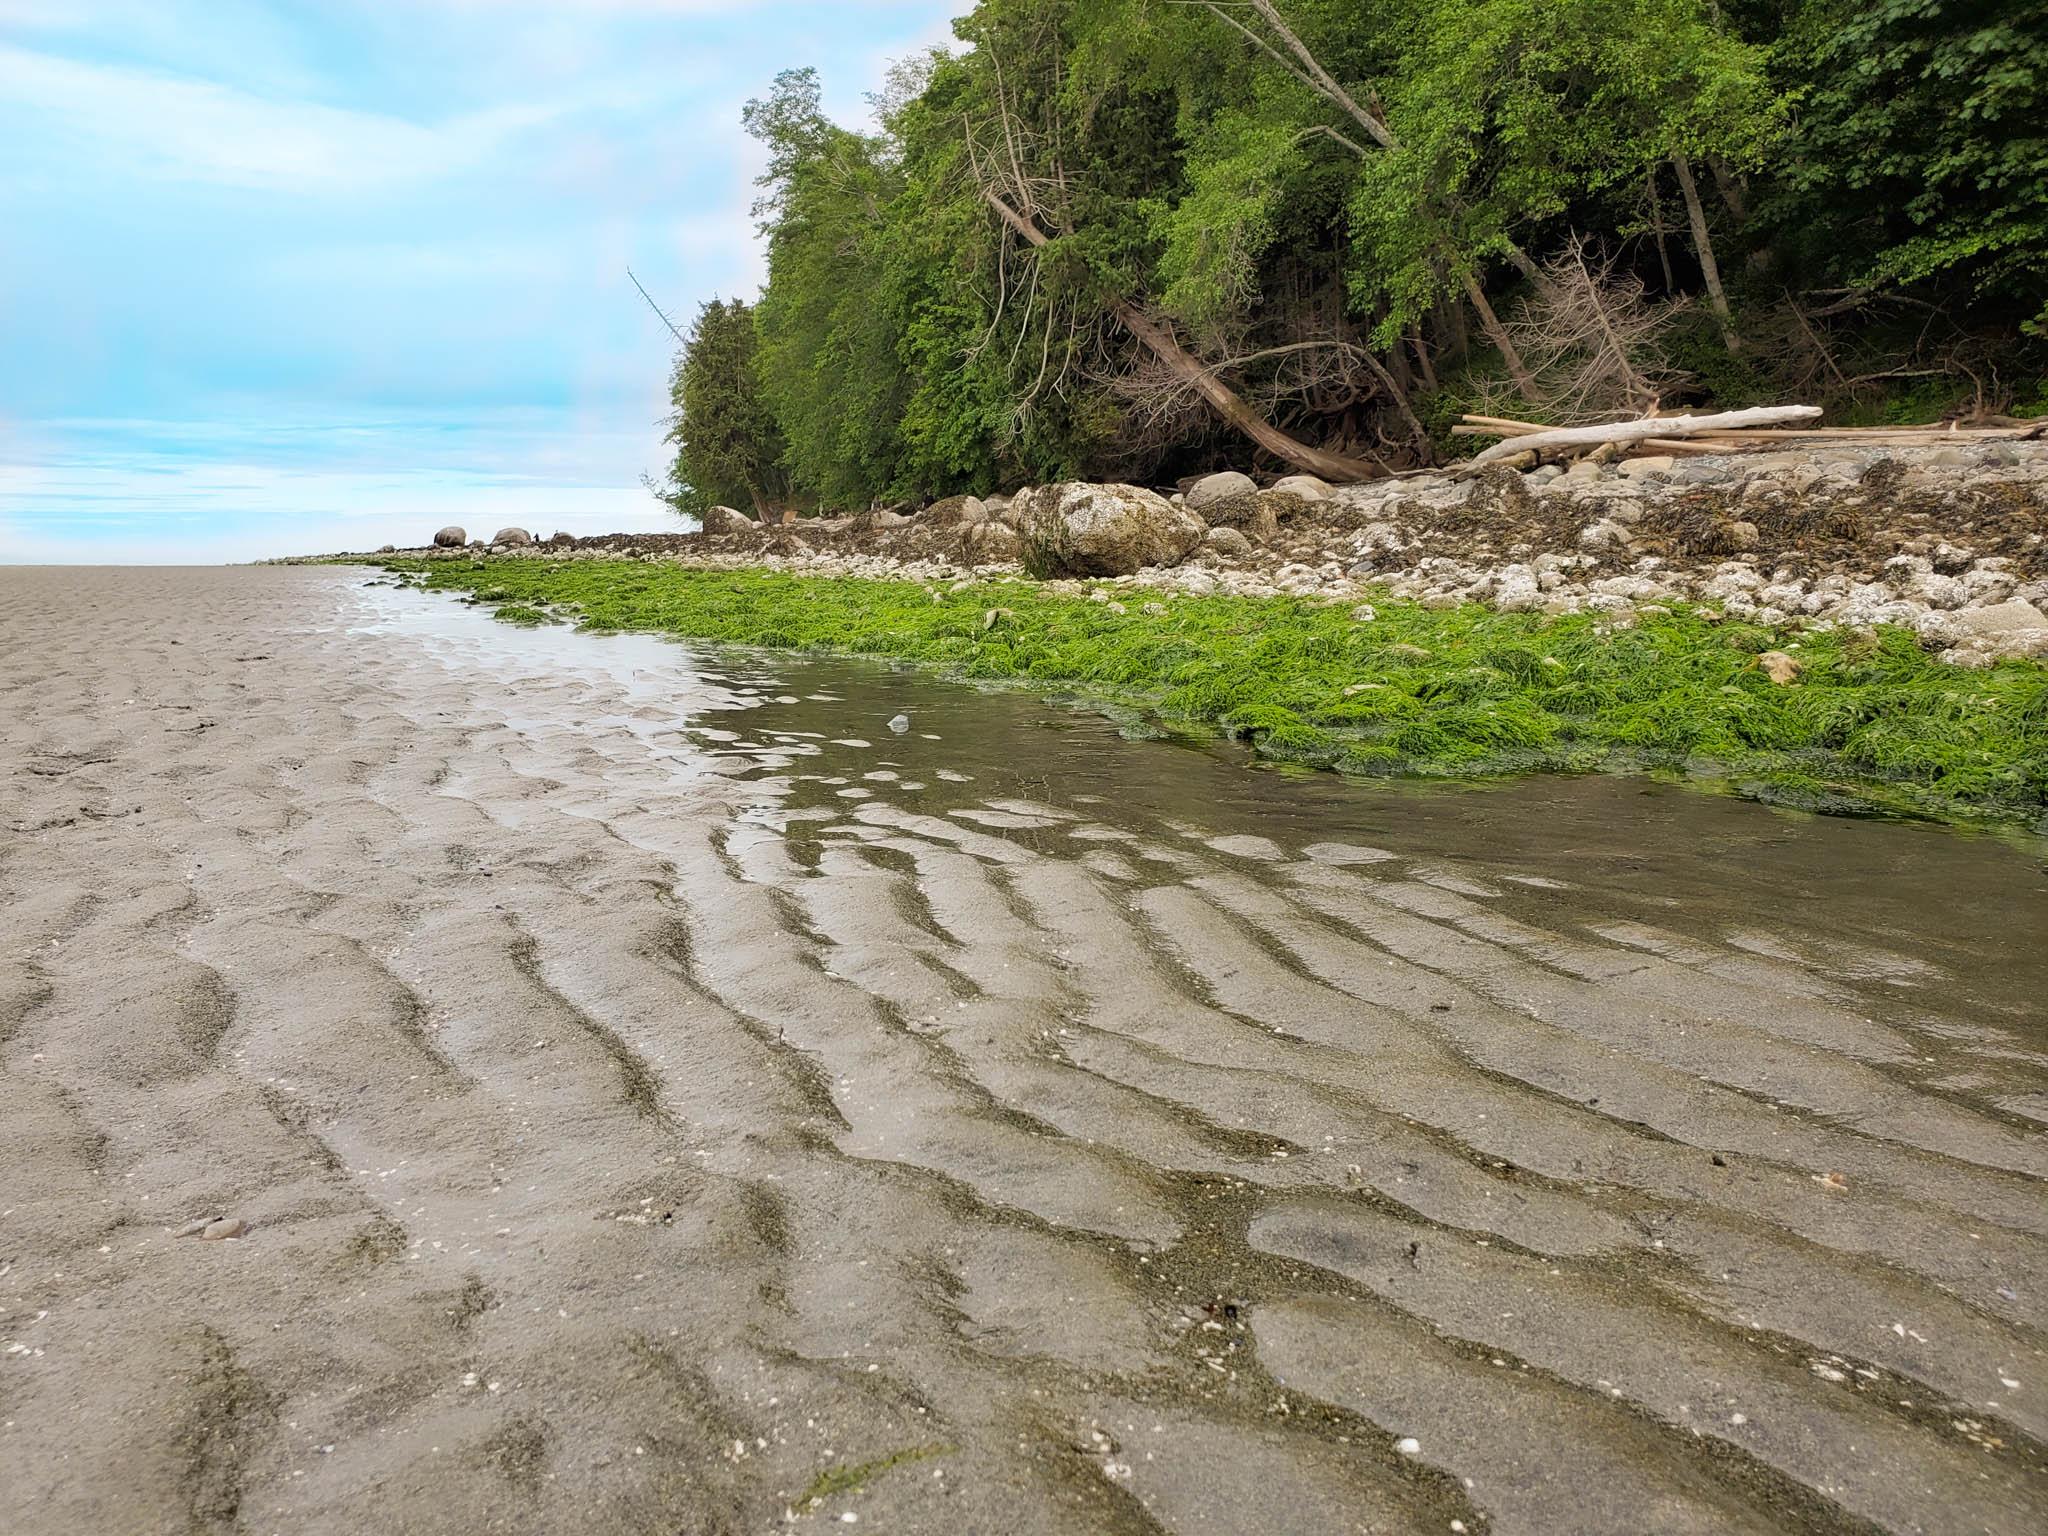 Invermere Beach Nanaimo - Cherie Baxter